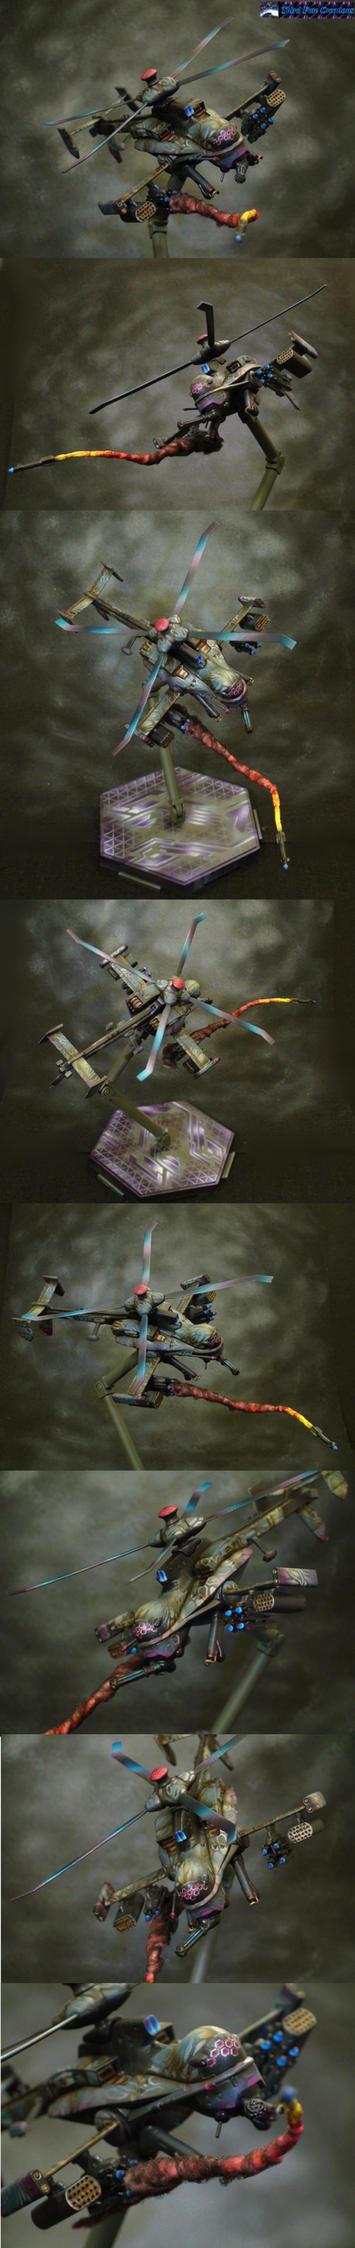 Jigabachi AV Cyberpunk Heli-Drone by Atropos907